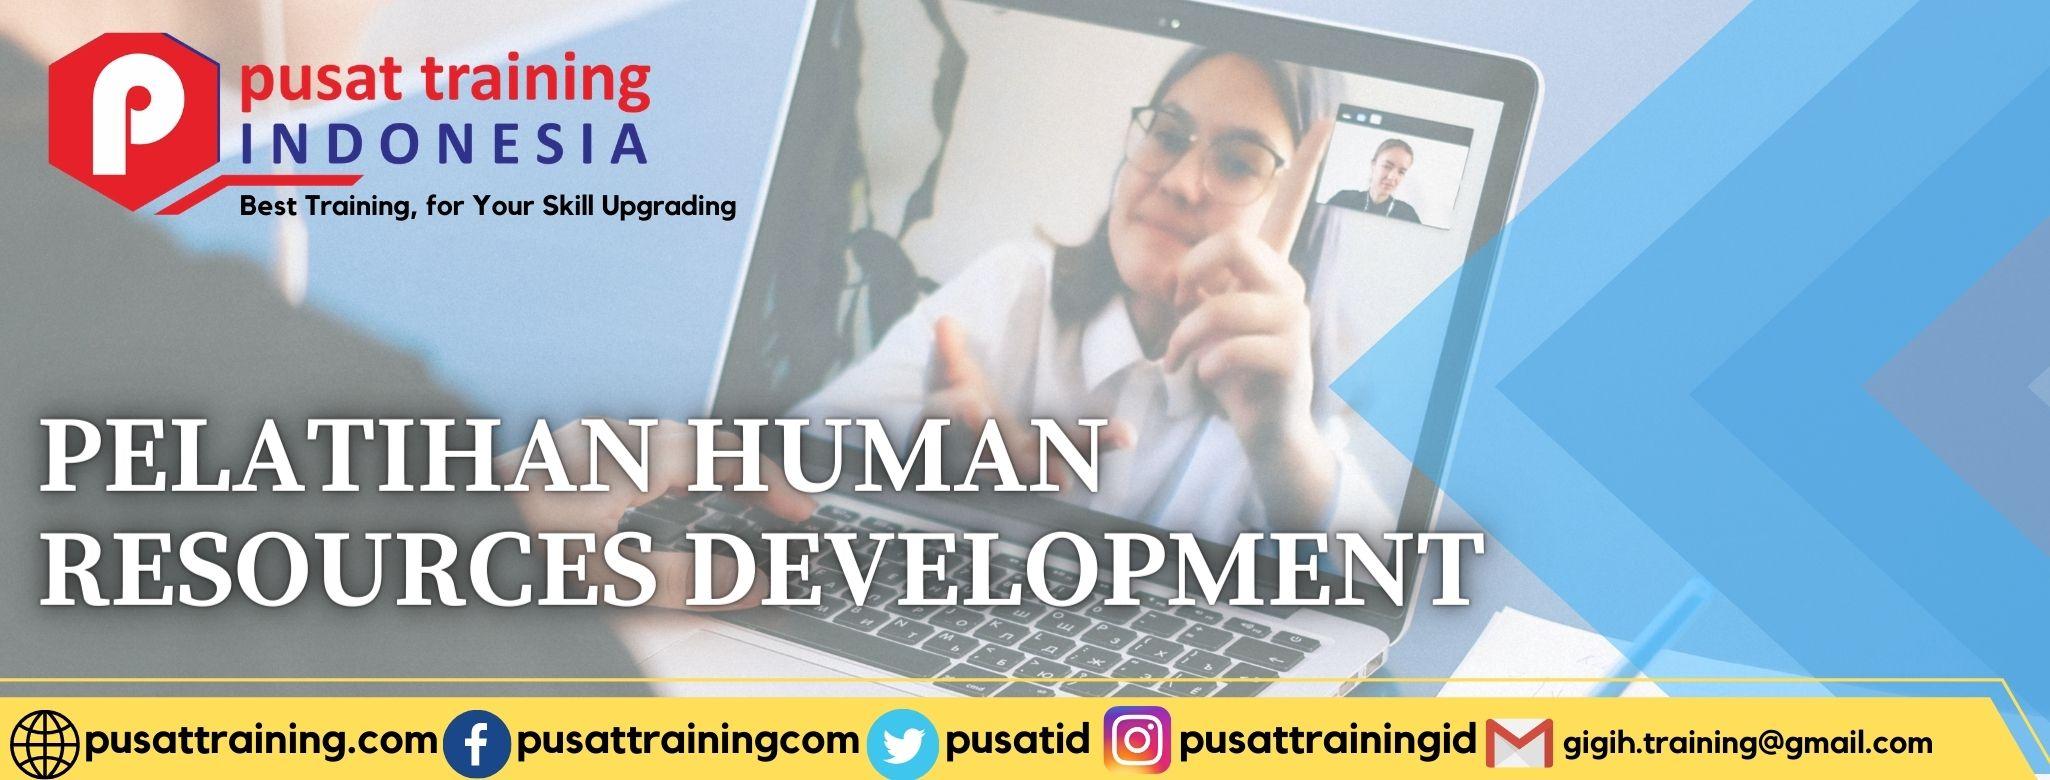 pelatihan-human-resources-development